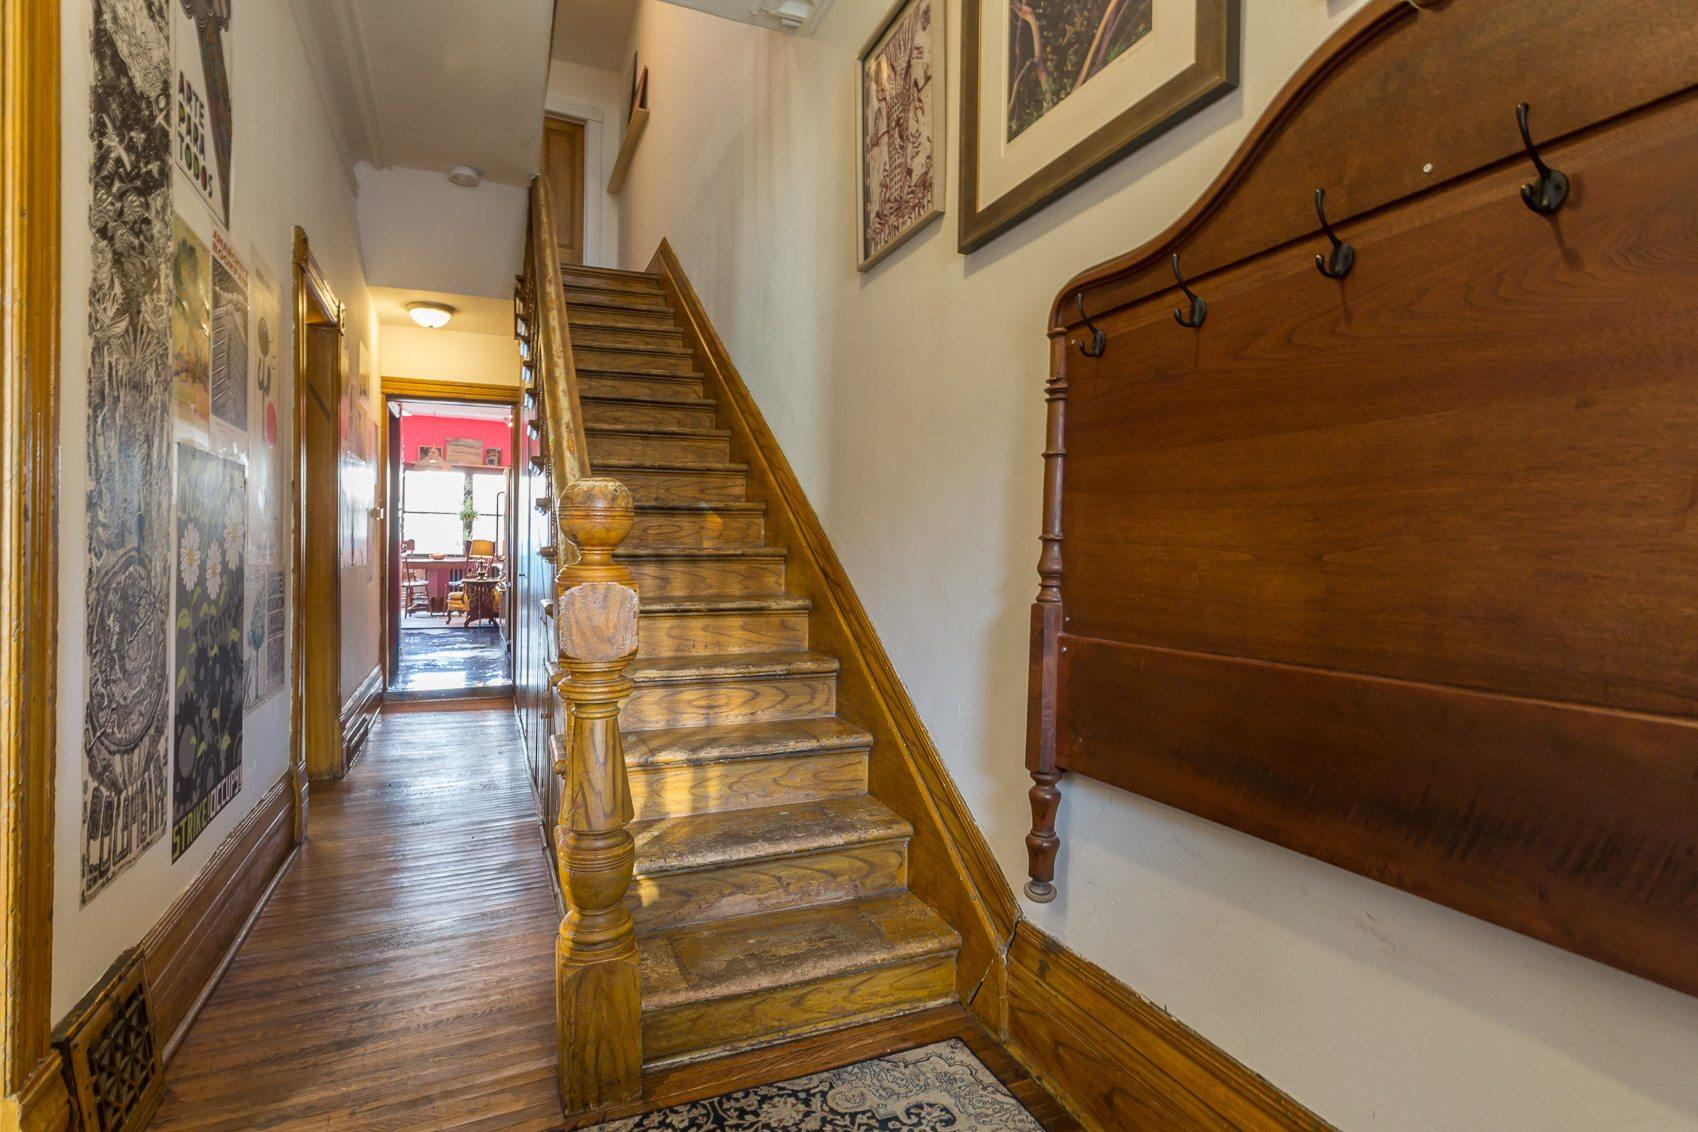 toronto-house-for-sale-44-nassau-street-3